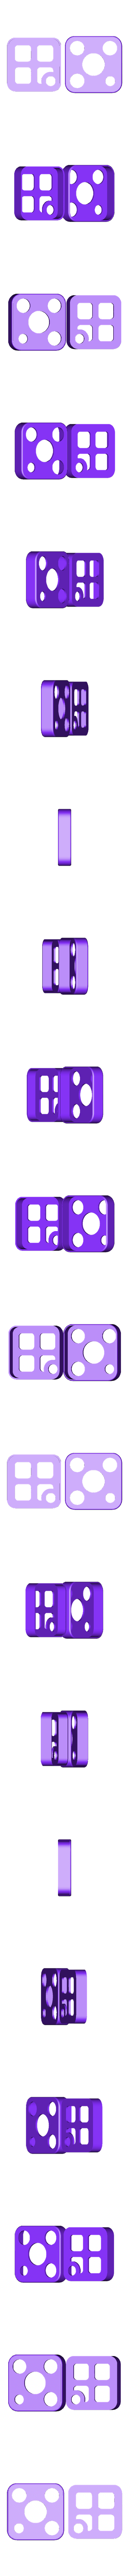 TileMate2018.stl Download free STL file Tile Mate Case (Fits Current Models 2018 and Forward) Anti-Pocker Presser • 3D print object, tonyyoungblood